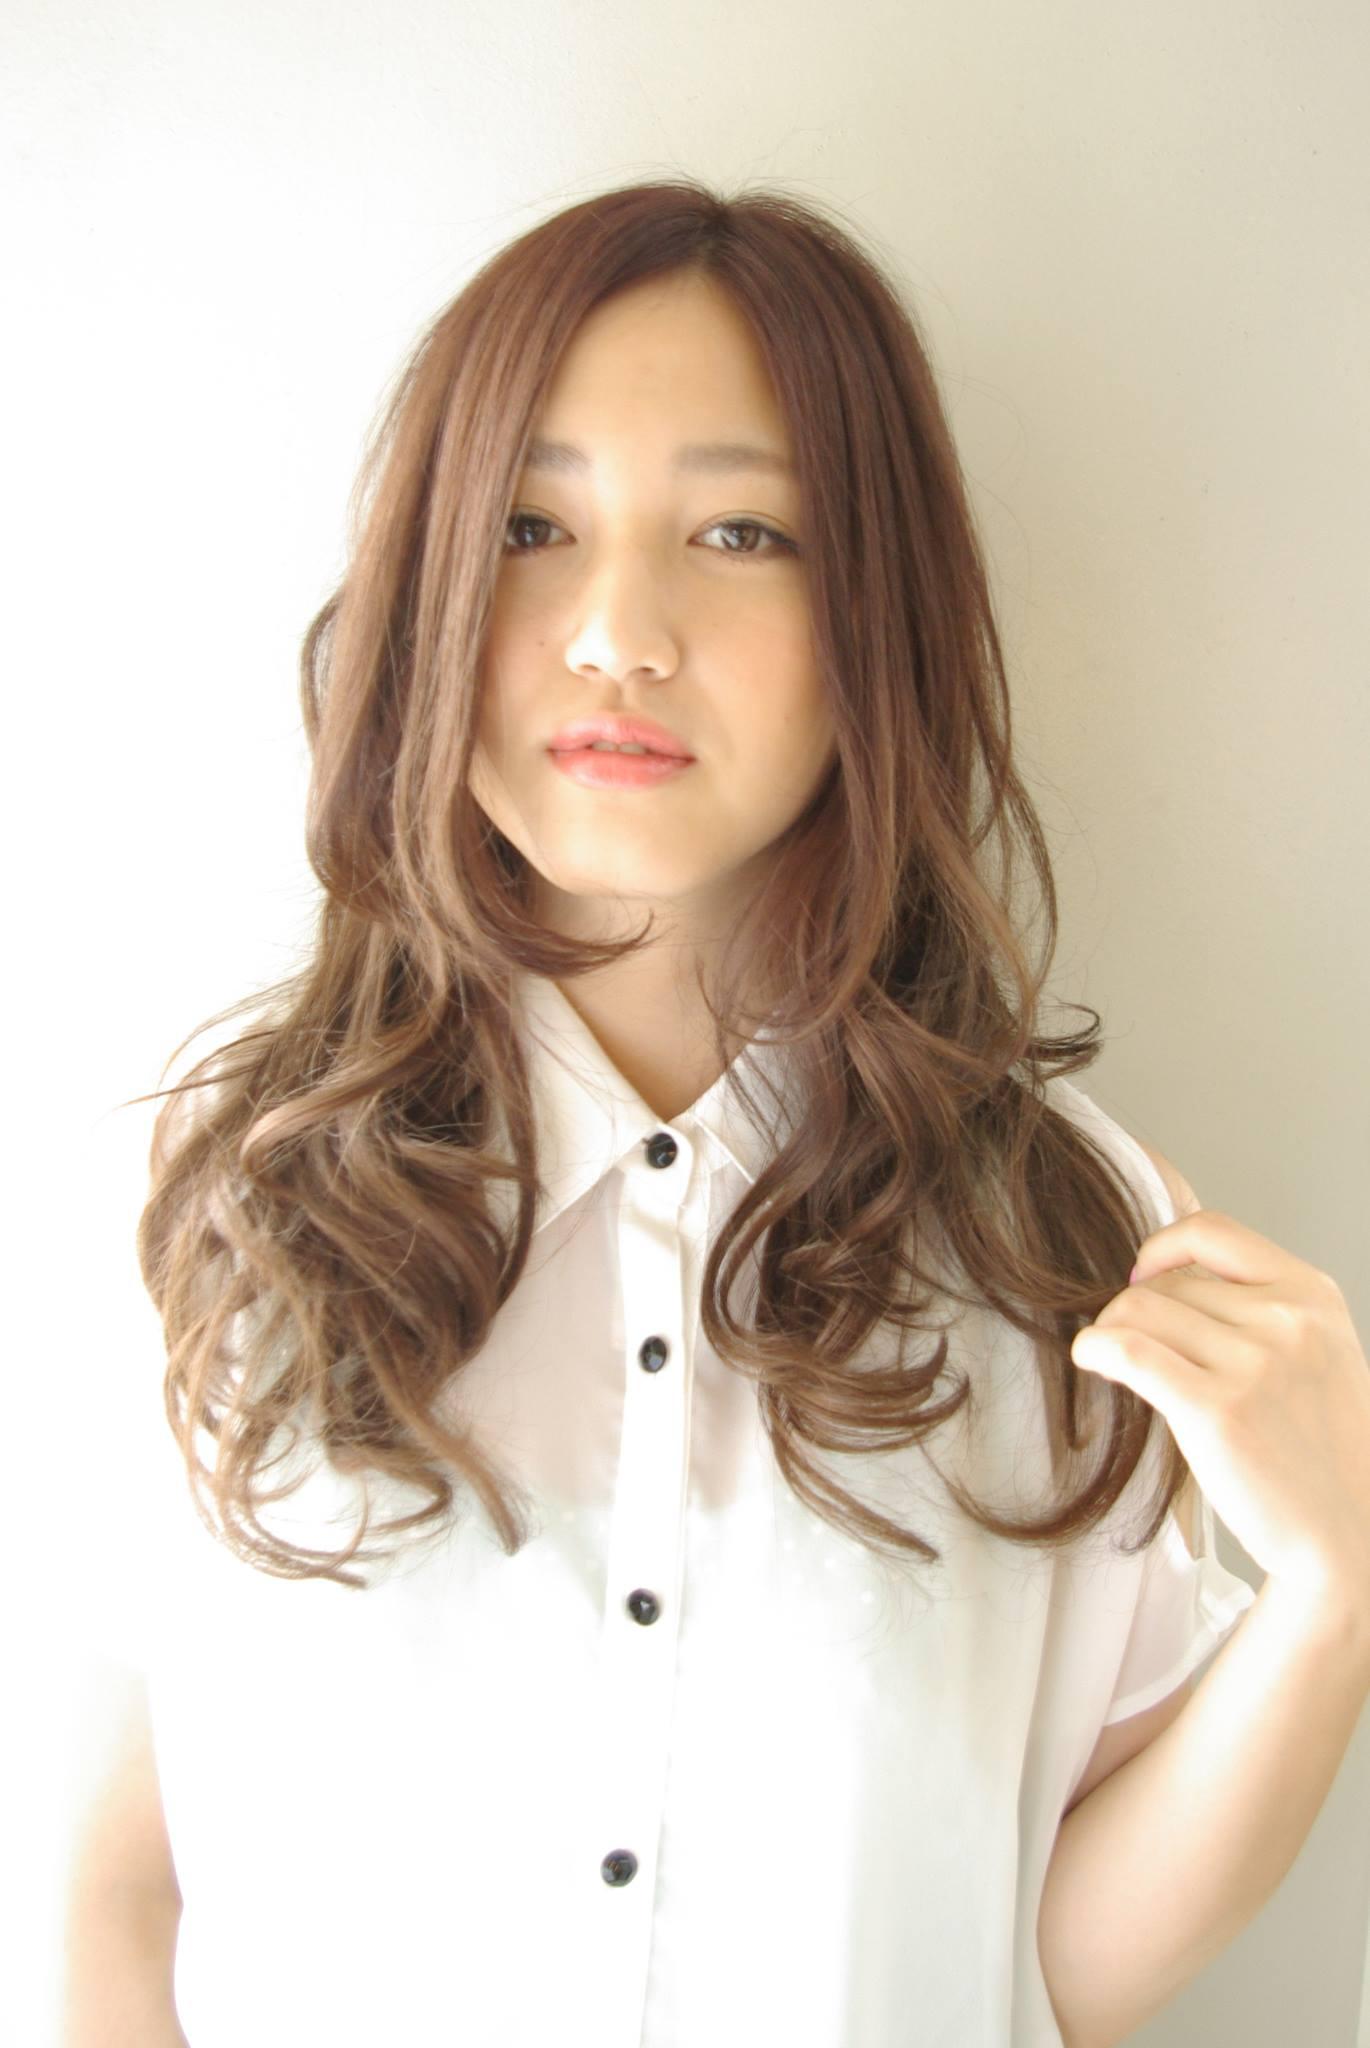 style0005-01